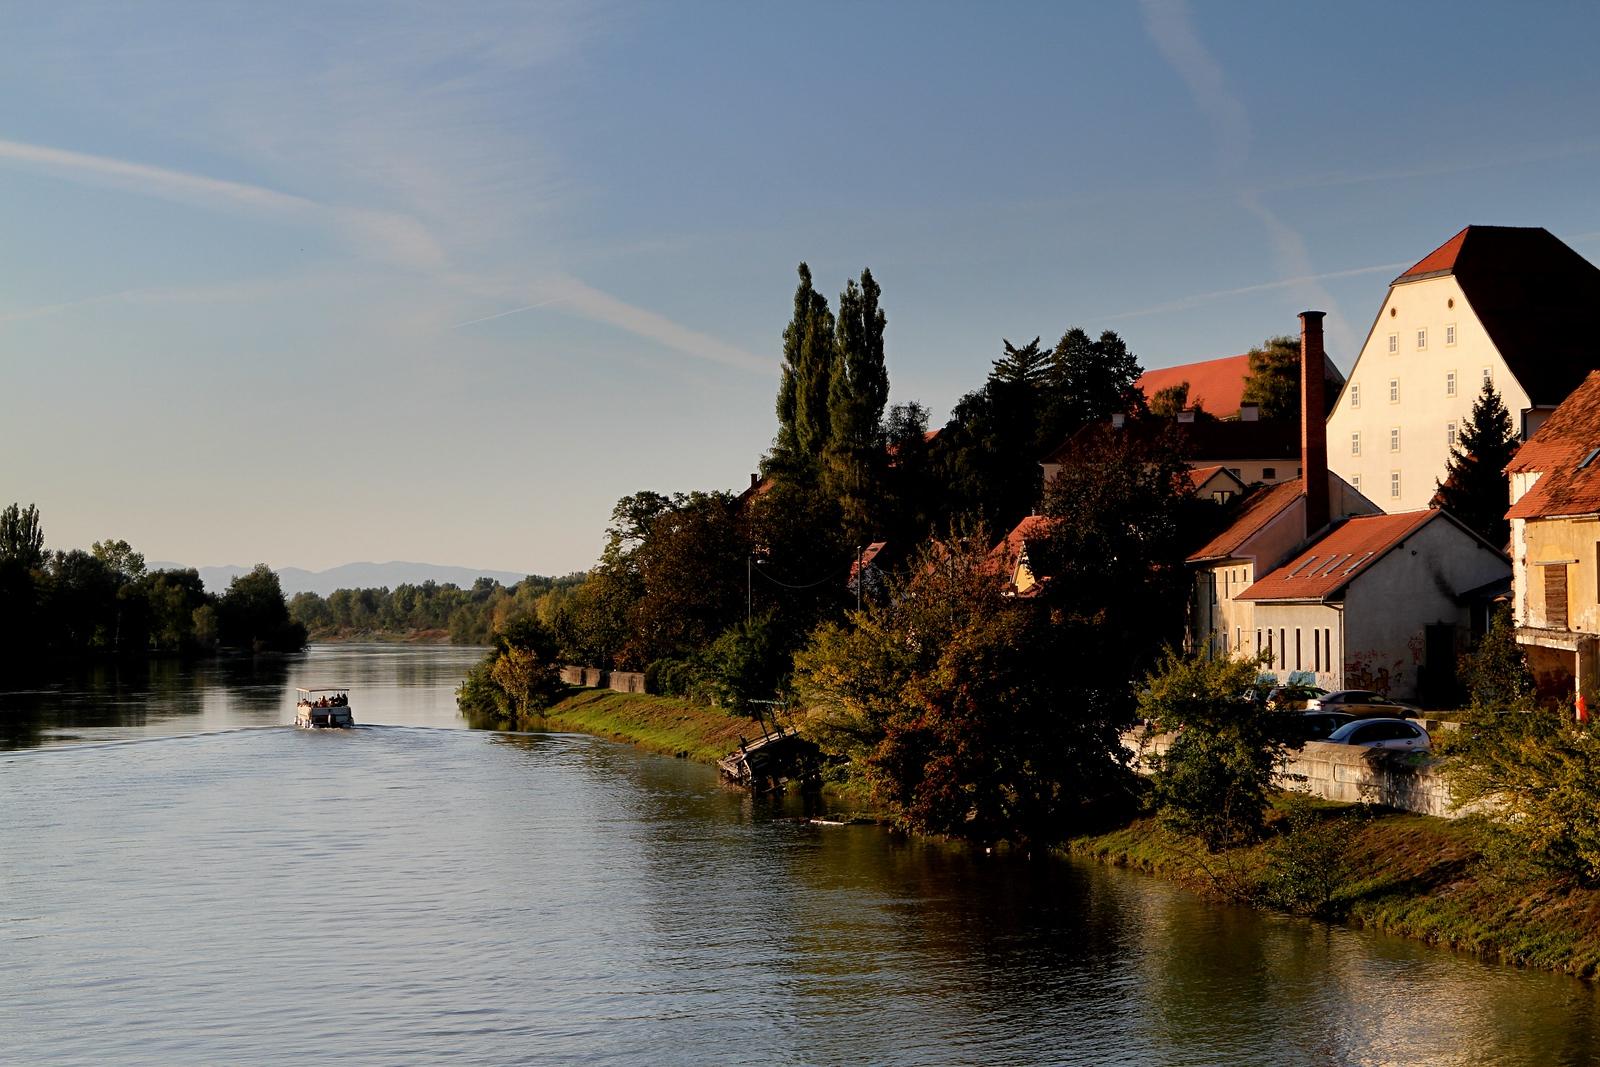 Beautiful Ptju by the Drava